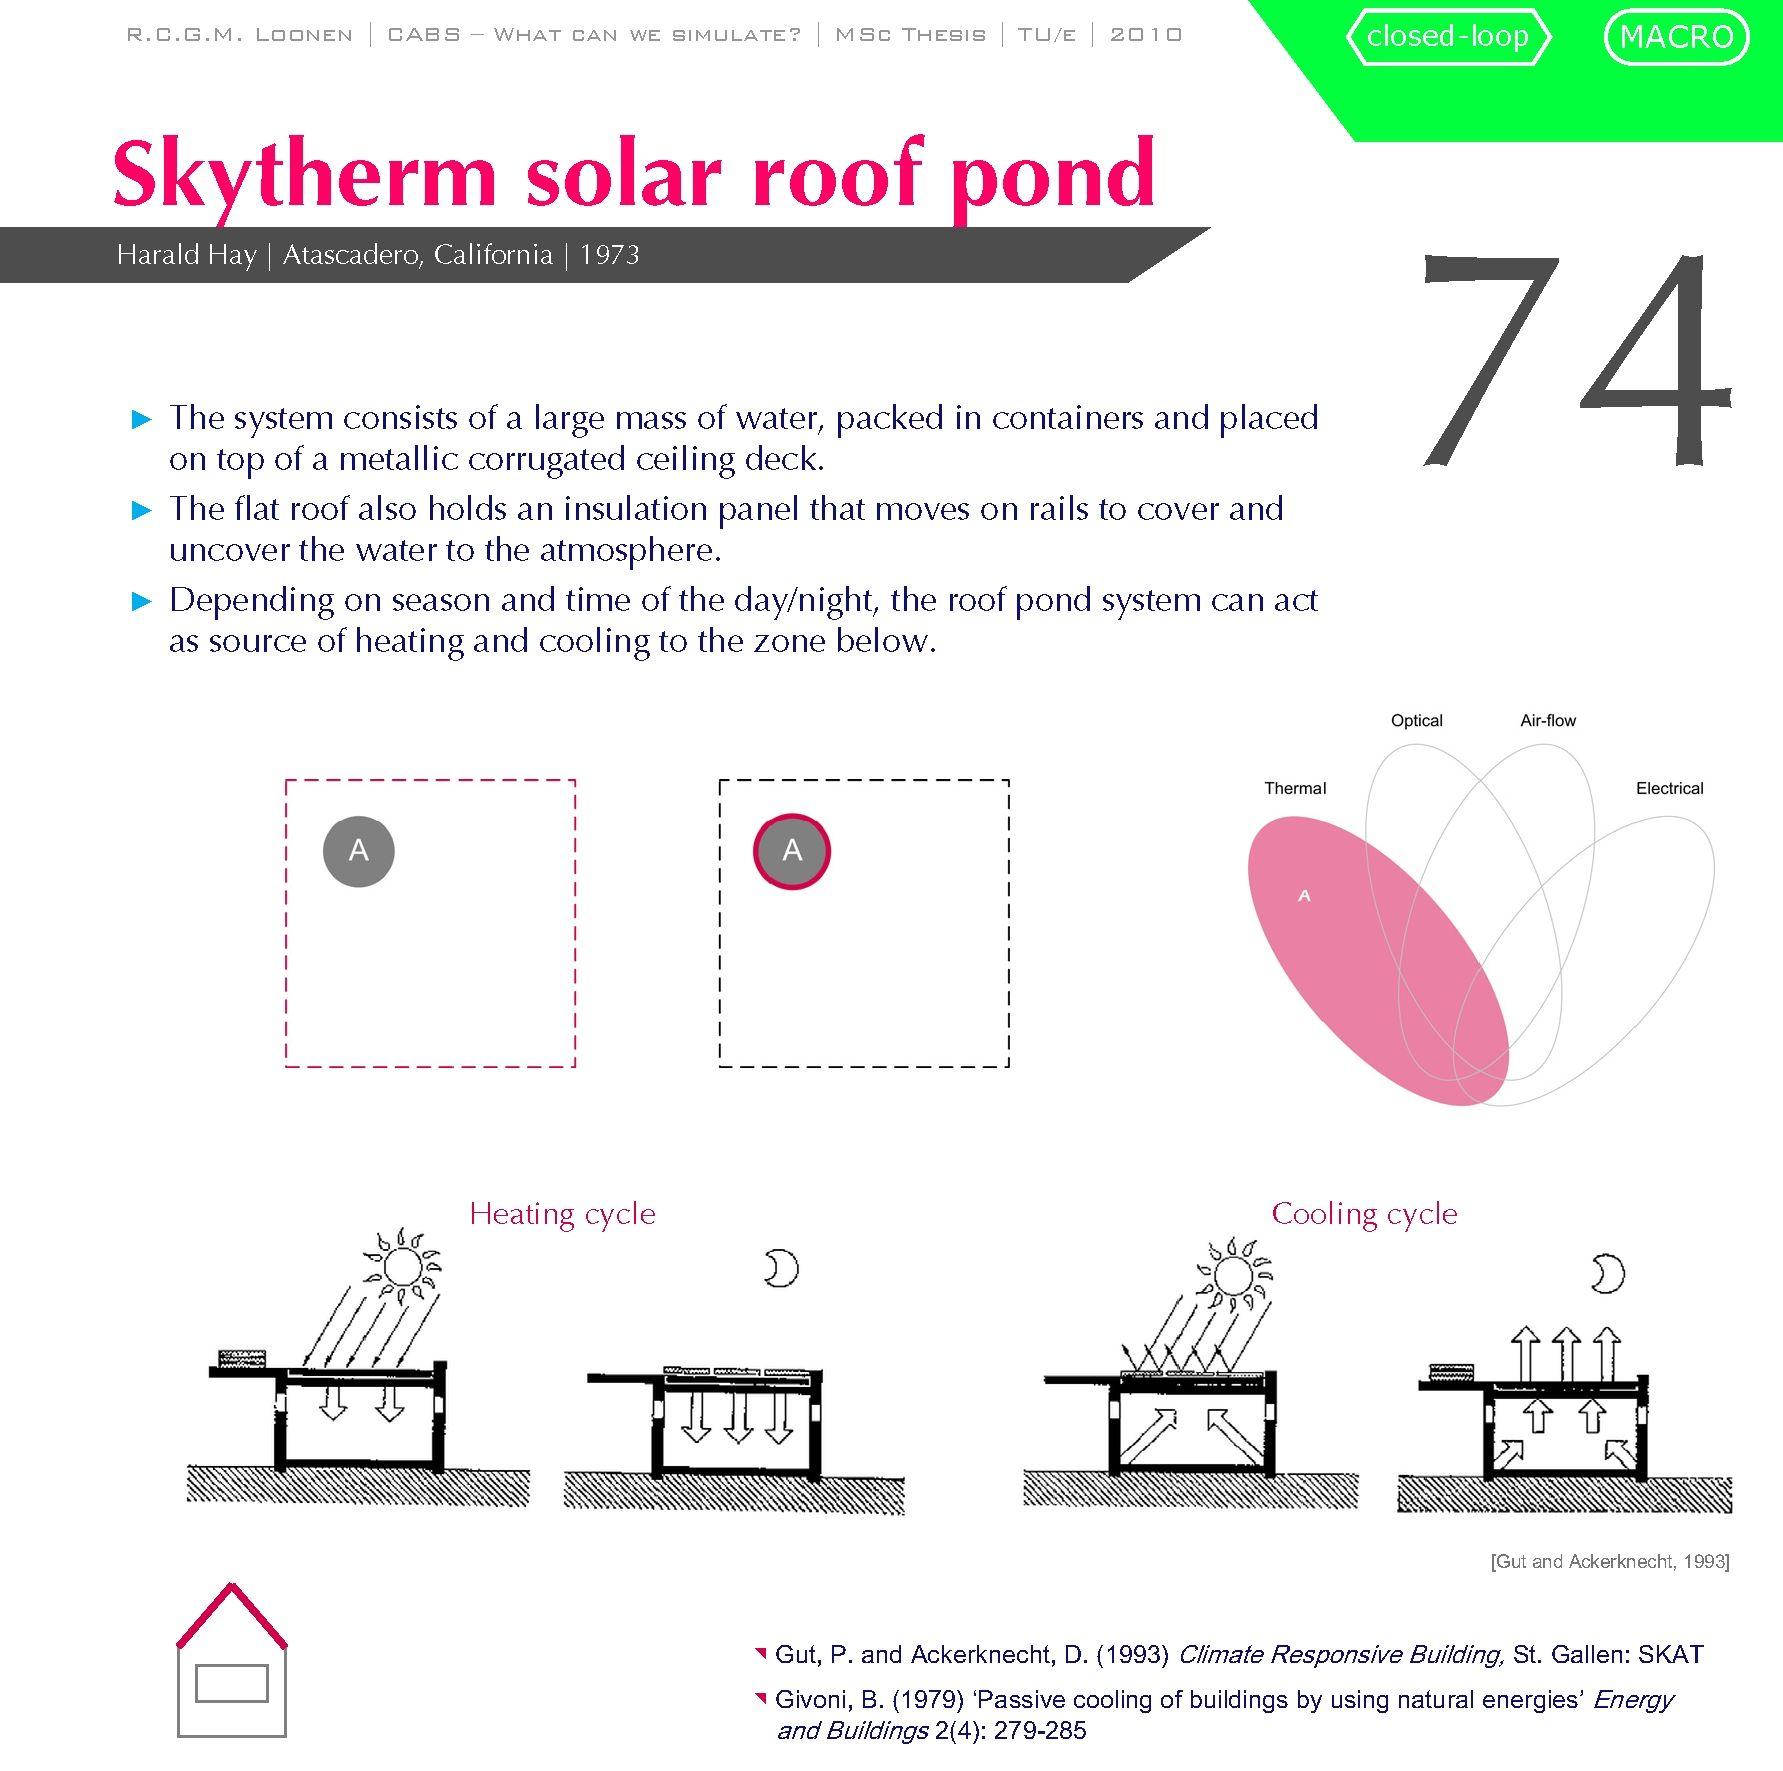 Skytherm Solar Roof Pond Solar Roof Roof Atascadero